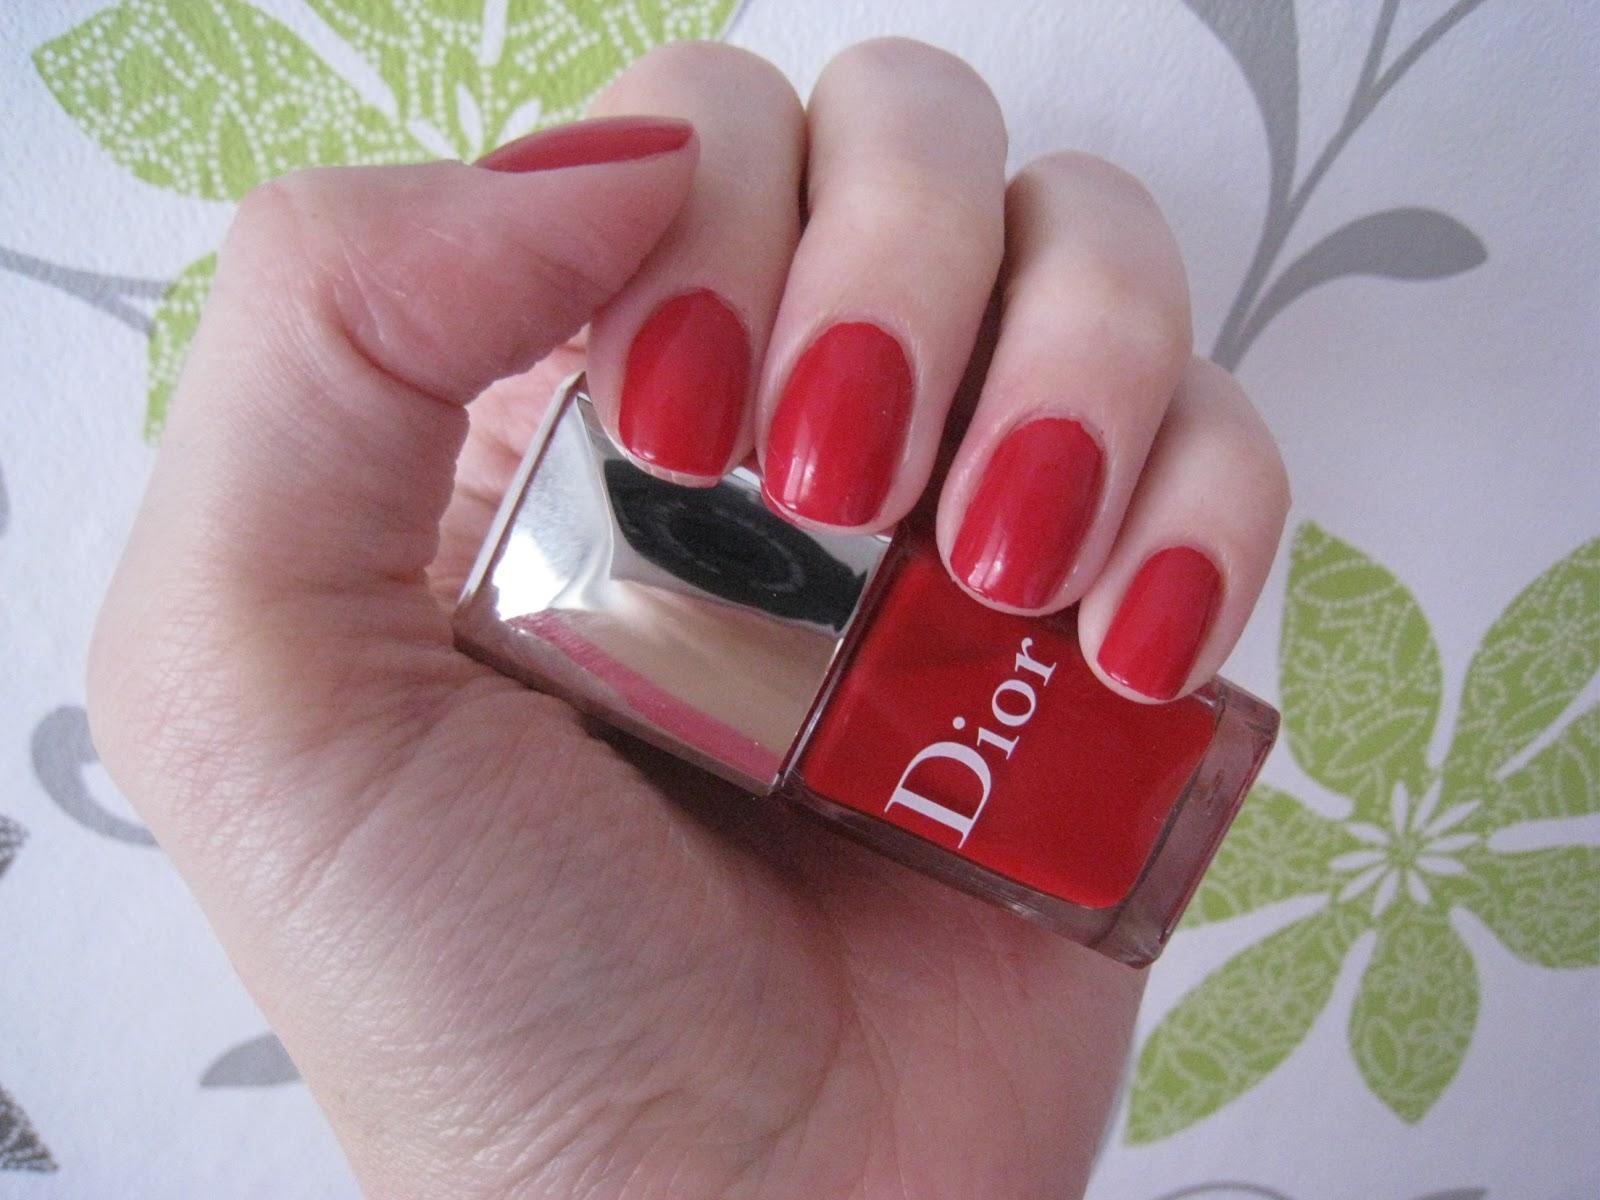 Zivot Na Vysoke Noze Dior Nail Enamel Lipstick